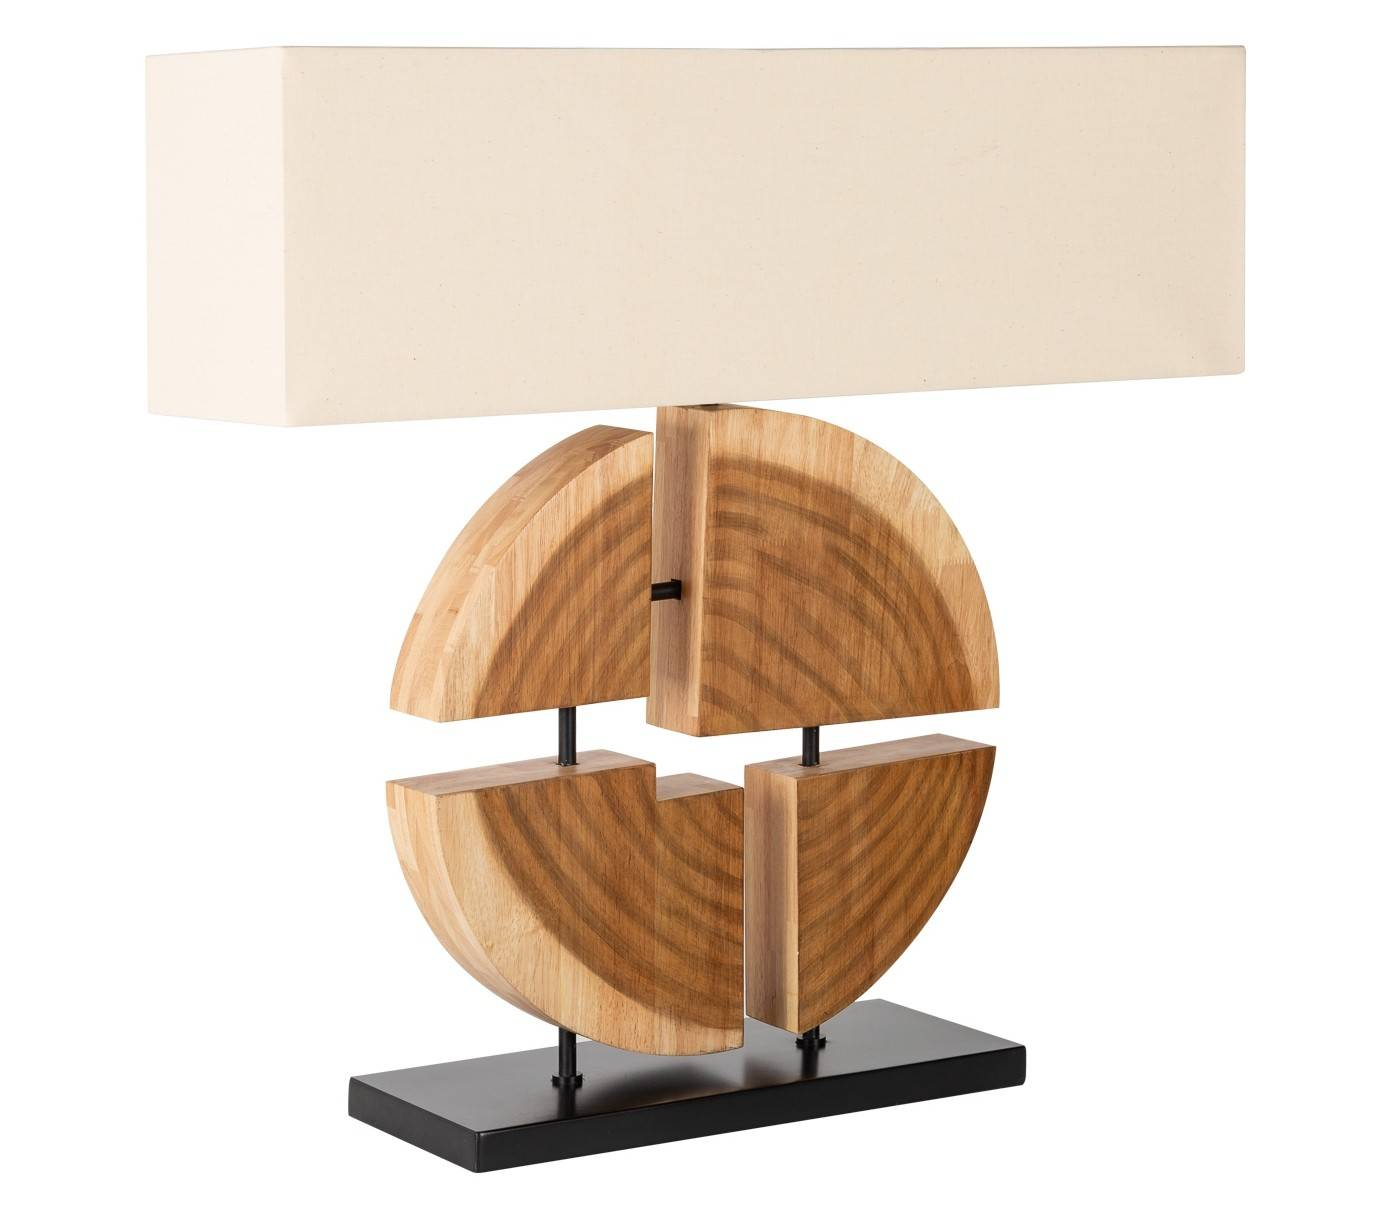 gdegdesign Lampe à poser design bois d'hévéa massif avec abat-jour - Tao